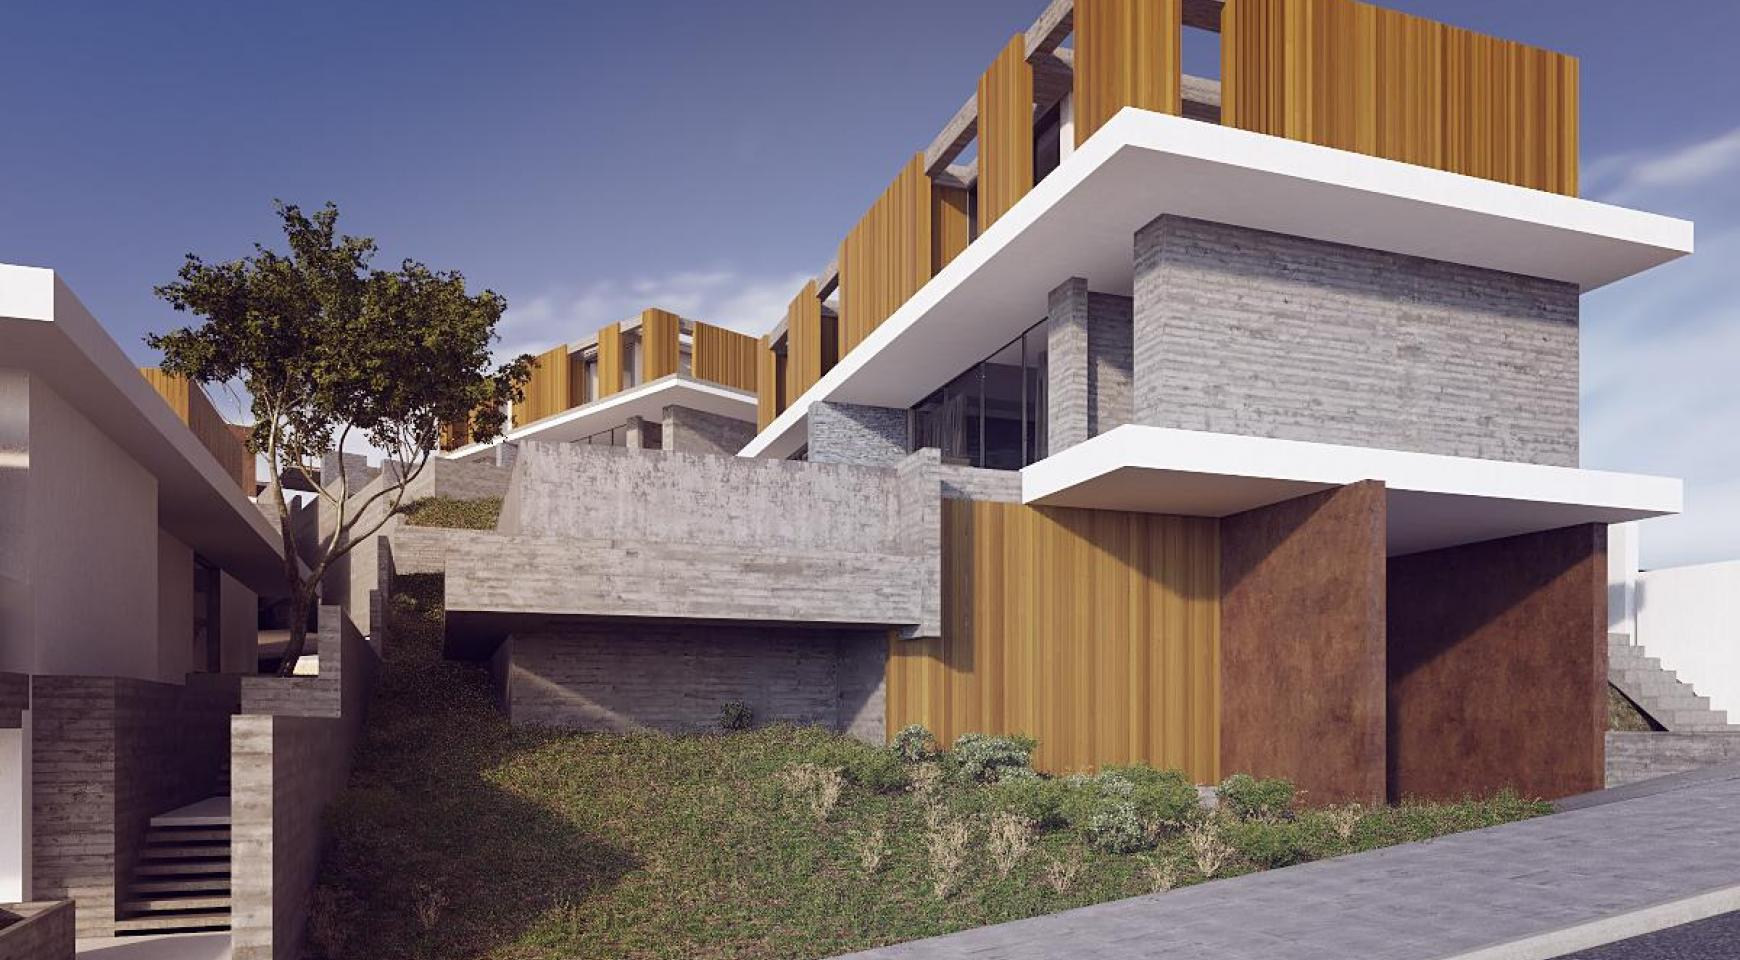 Exclusive 4 Bedroom Villa with Stunning Views in Germasogeia - 5